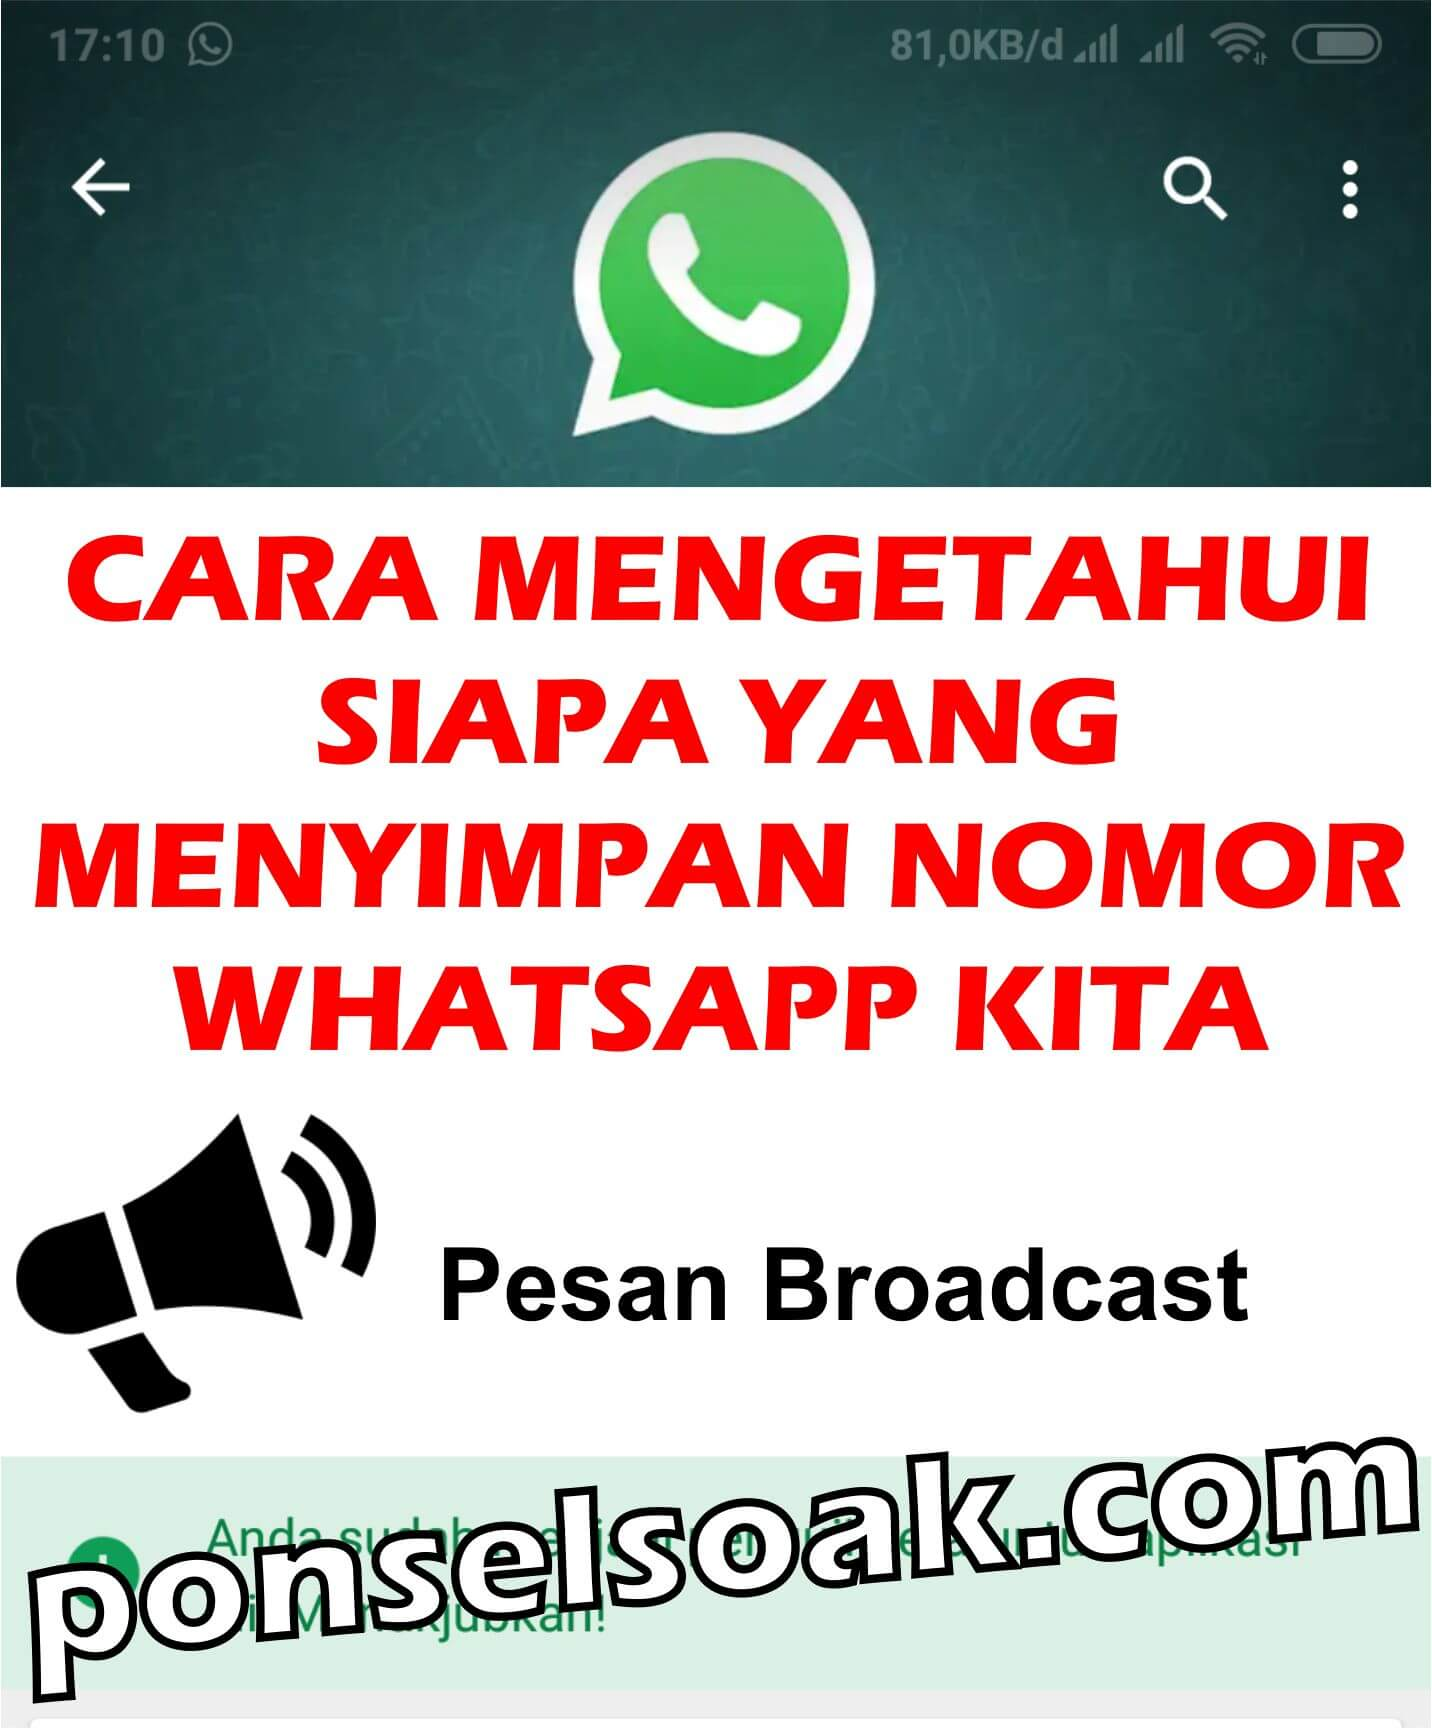 2+ Cara Mengetahui Siapa Yang Menyimpan Nomor WhatsApp Kita